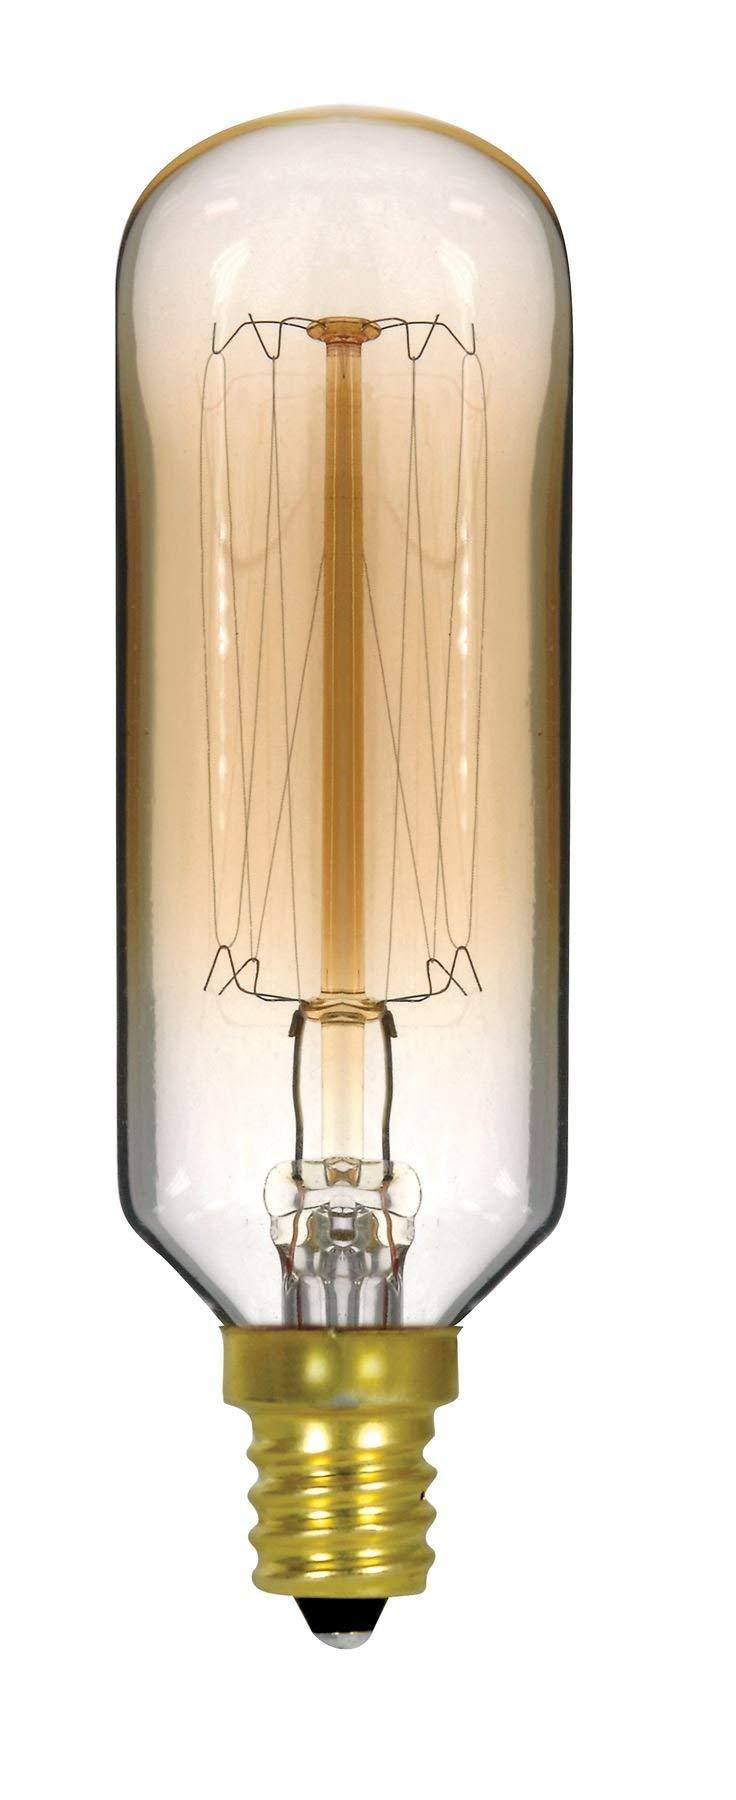 Satco 40T9/GOLD/9S/E12/120V /Vintage Incandescent Vintage Light, 40W E12 T9, Clear Gold Bulb [Pack of 12]